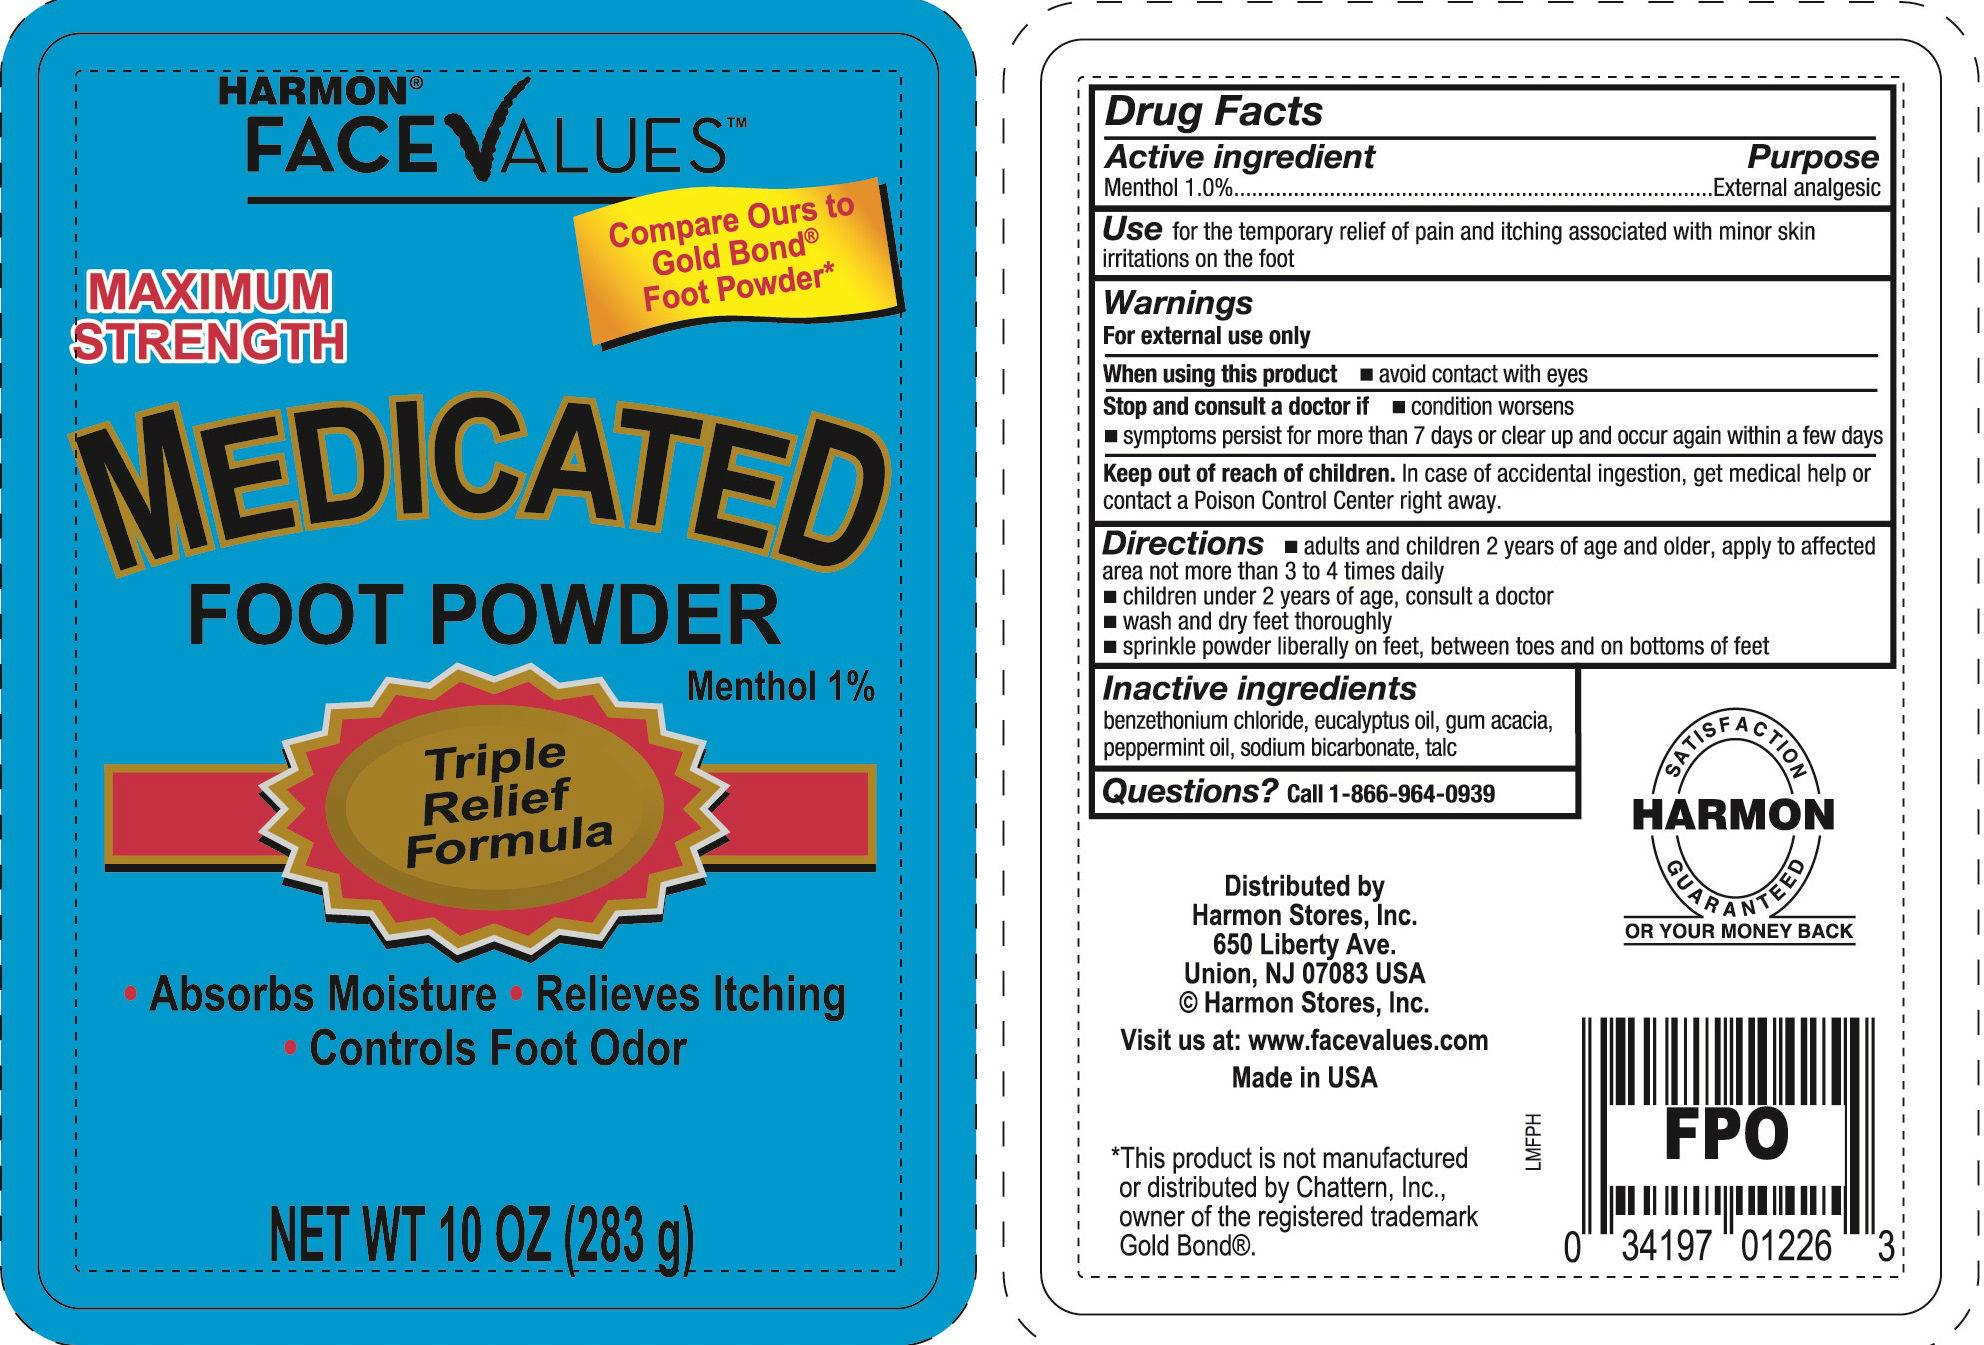 Harmon Medicated Foot PowderCV.jpg